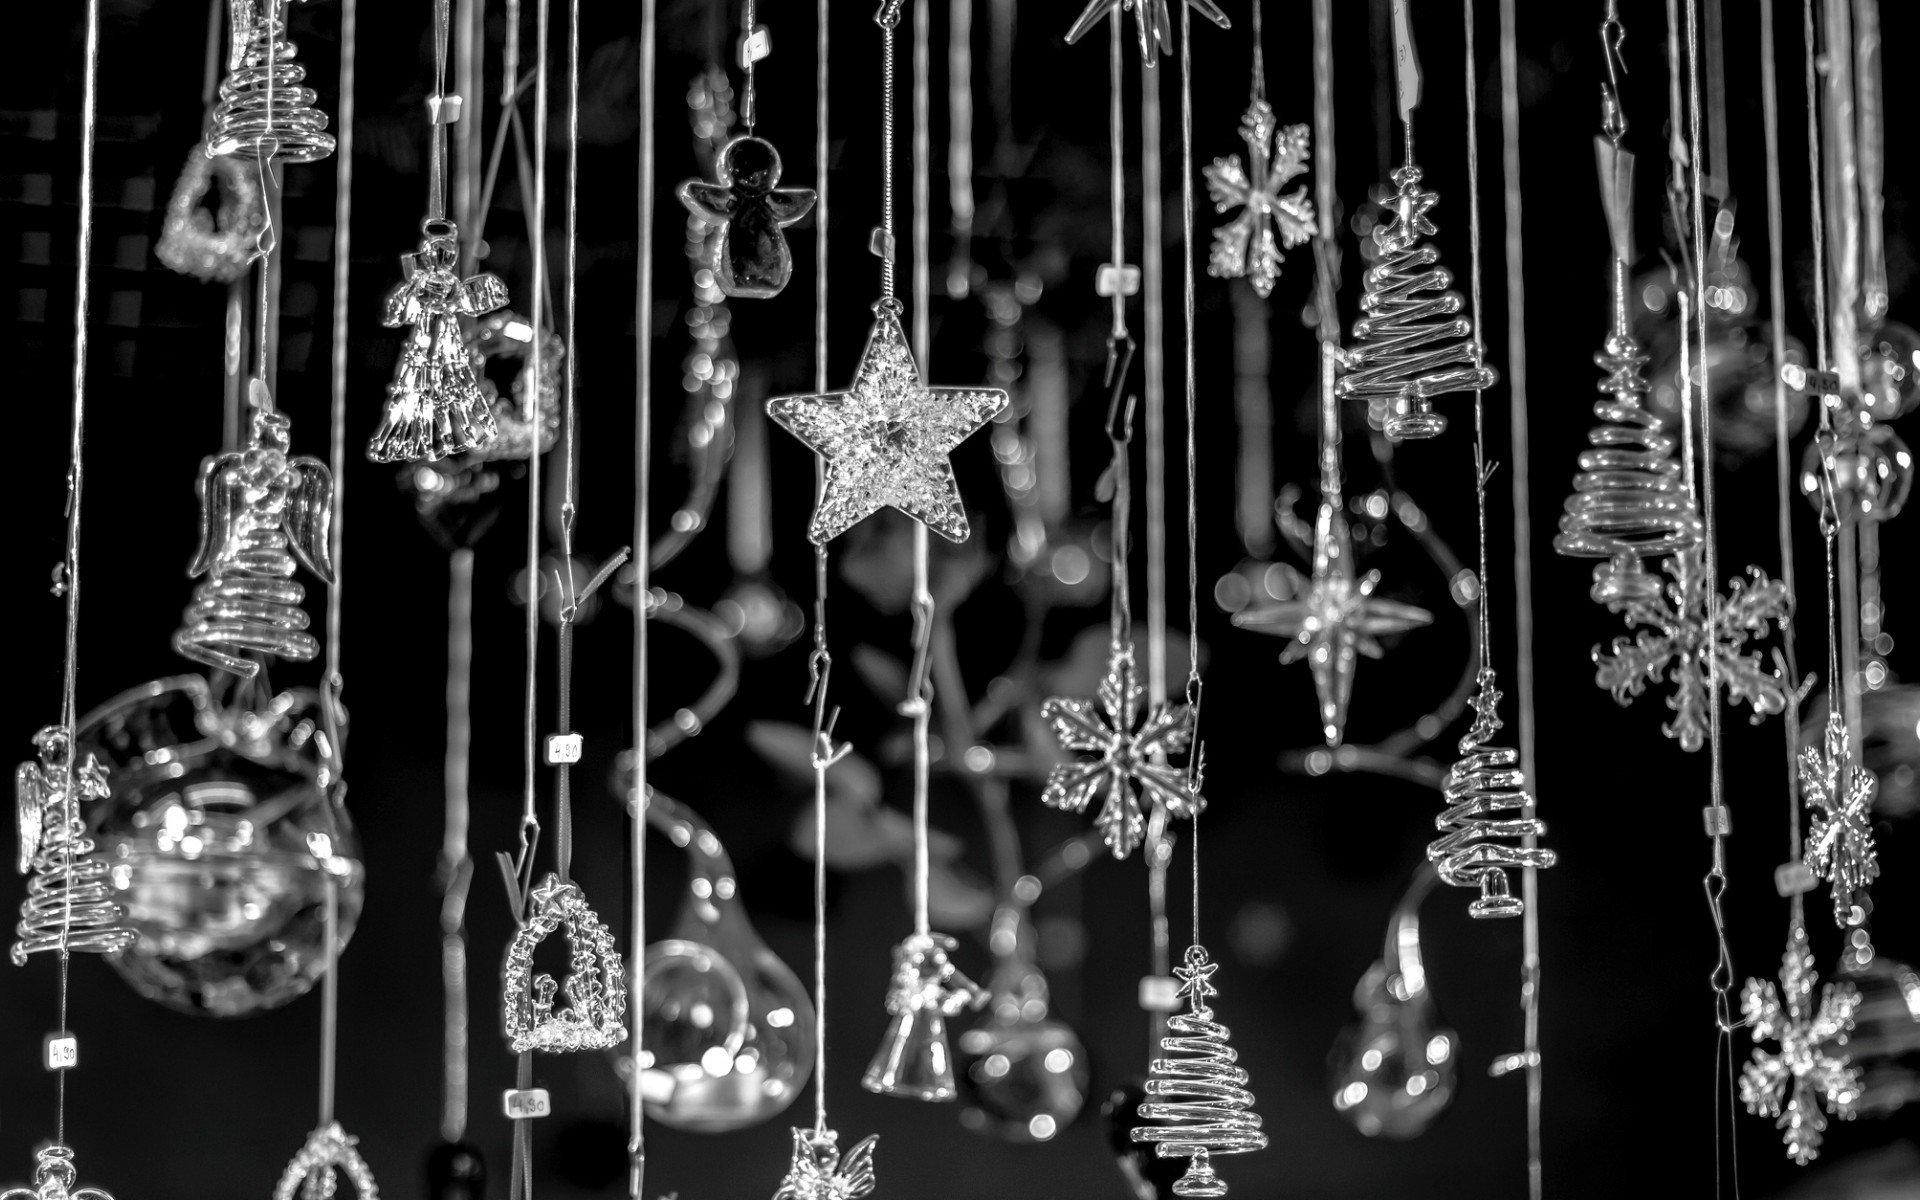 Wallpaper : 1920x1200 px, black, bokeh, chain, Christmas, holidays